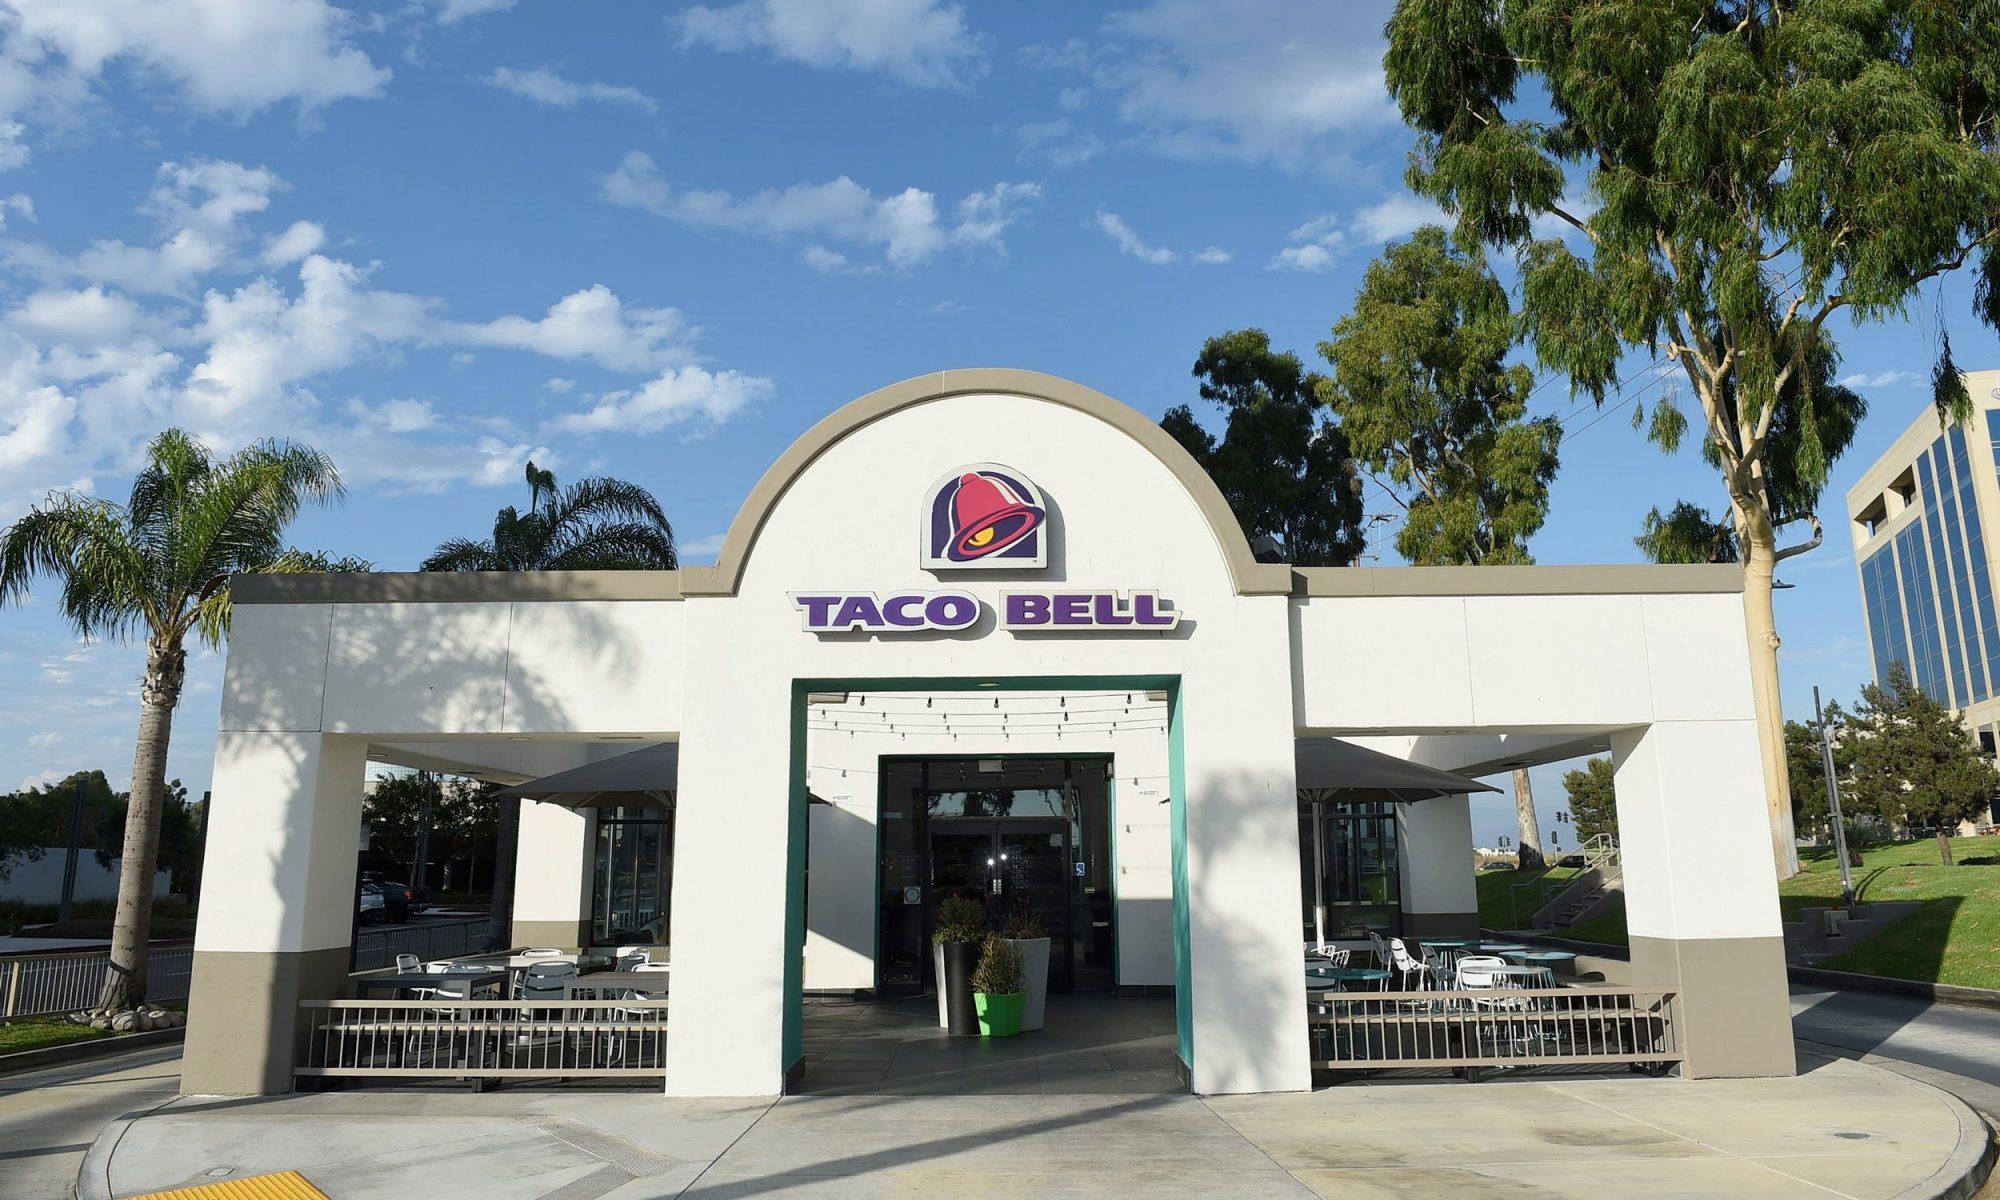 EC: Taco Bell Sells Beer Now